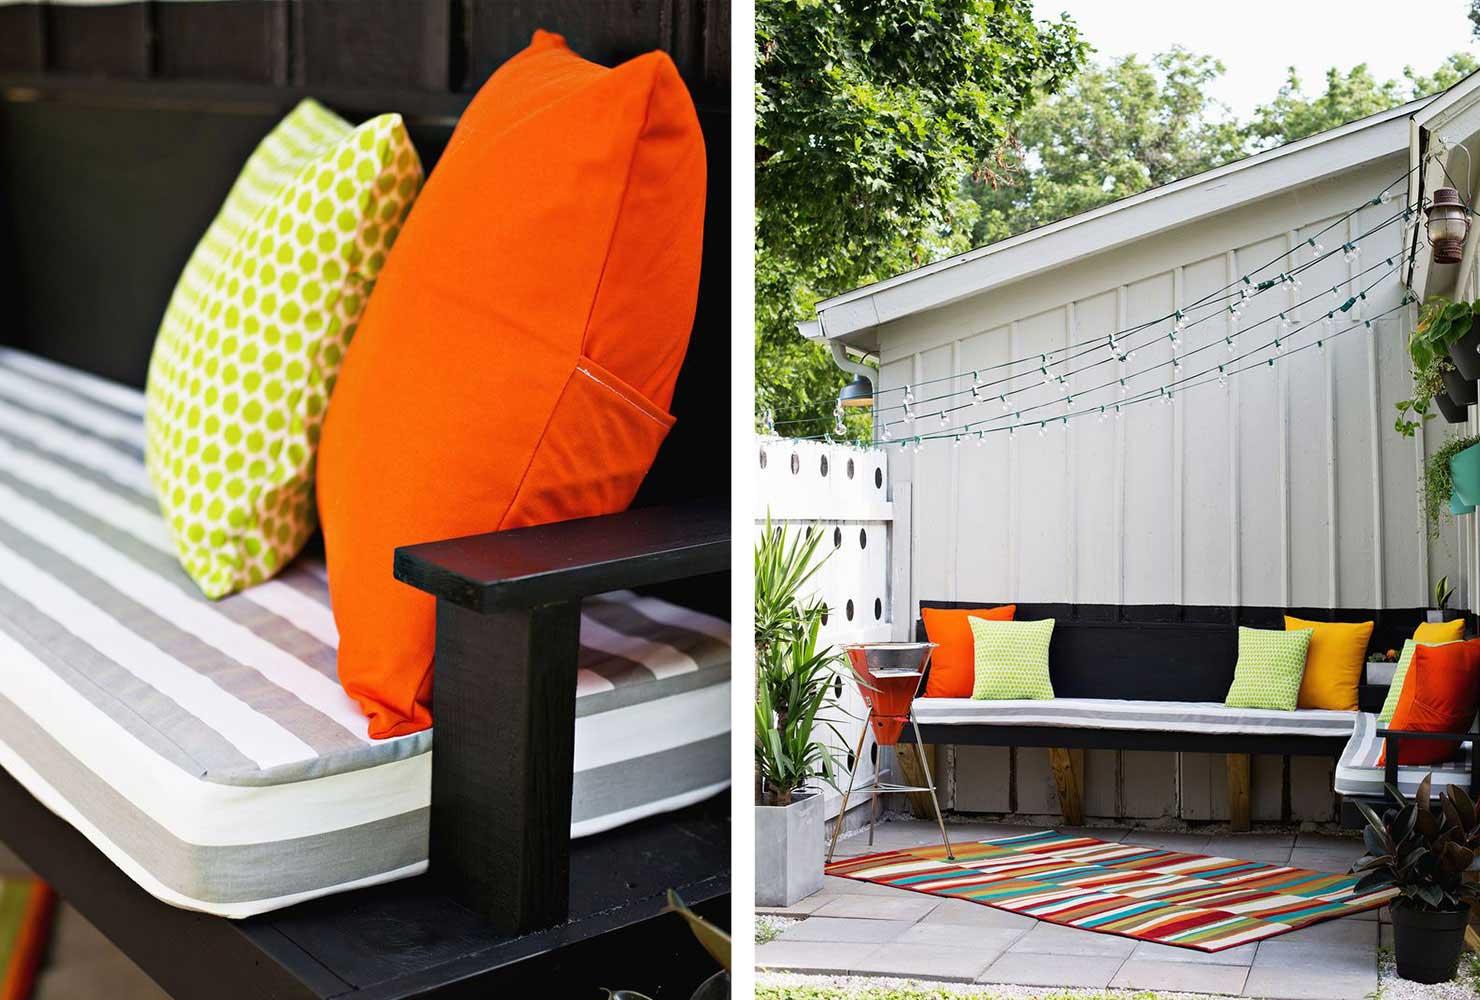 45+ DIY Patio Ideas to Brighten Your Space | Shutterfly on Diy Garden Patio Ideas id=32916